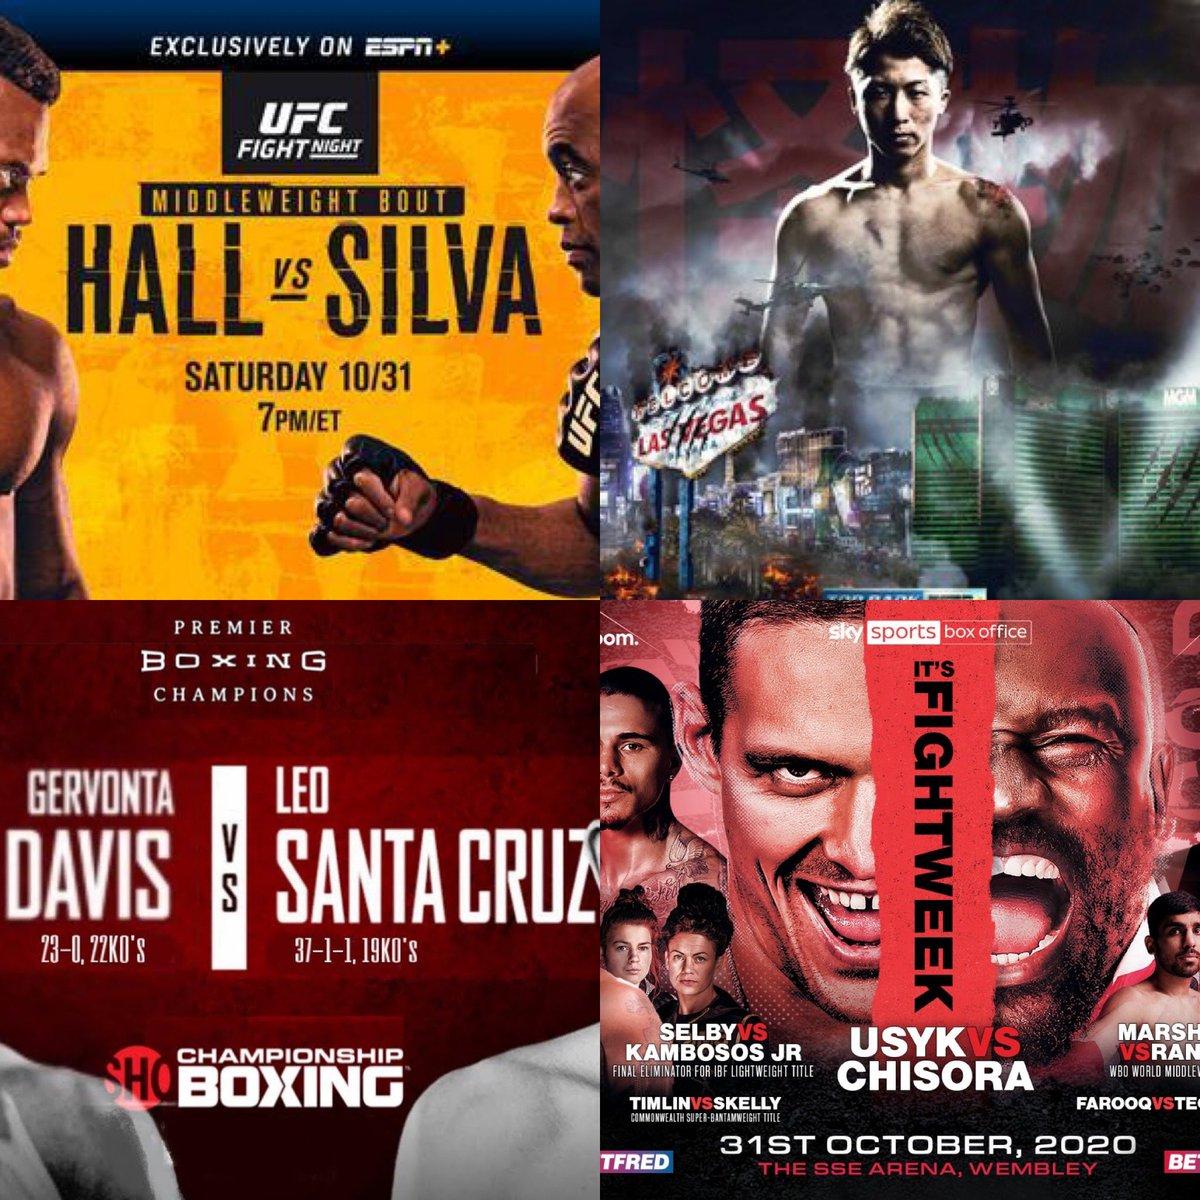 A lot to take in & watch on Saturday  🤯🤯🤯🤯#UsykChisora #UFCVegas11 #InoueMoloney #DavisSantaCruz #boxing #MMA https://t.co/yBju30DYfn